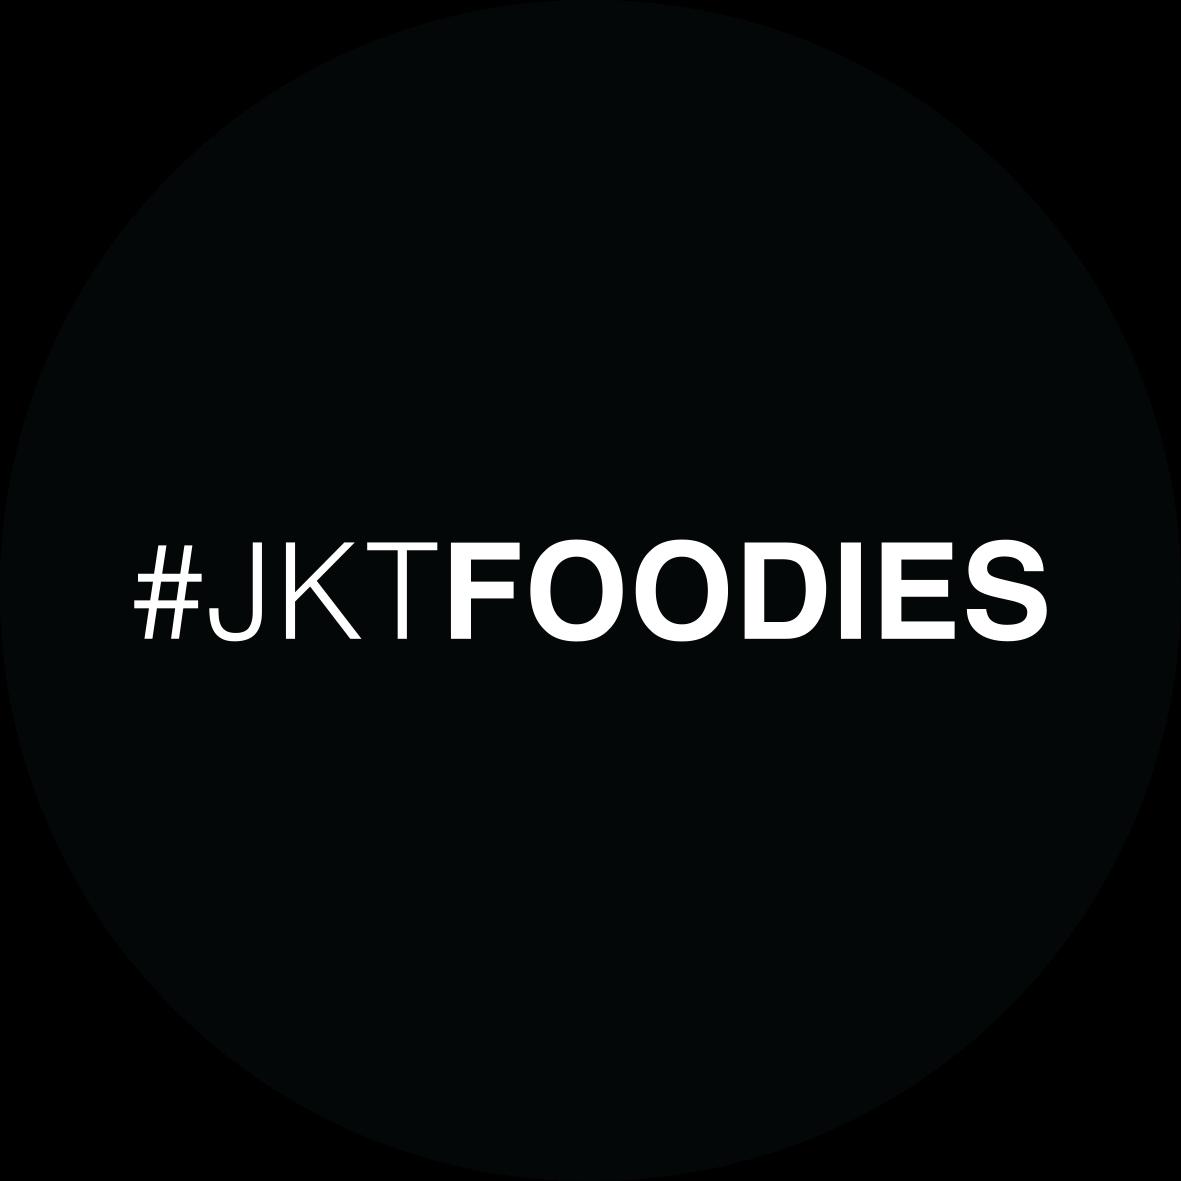 #JKTfoodies